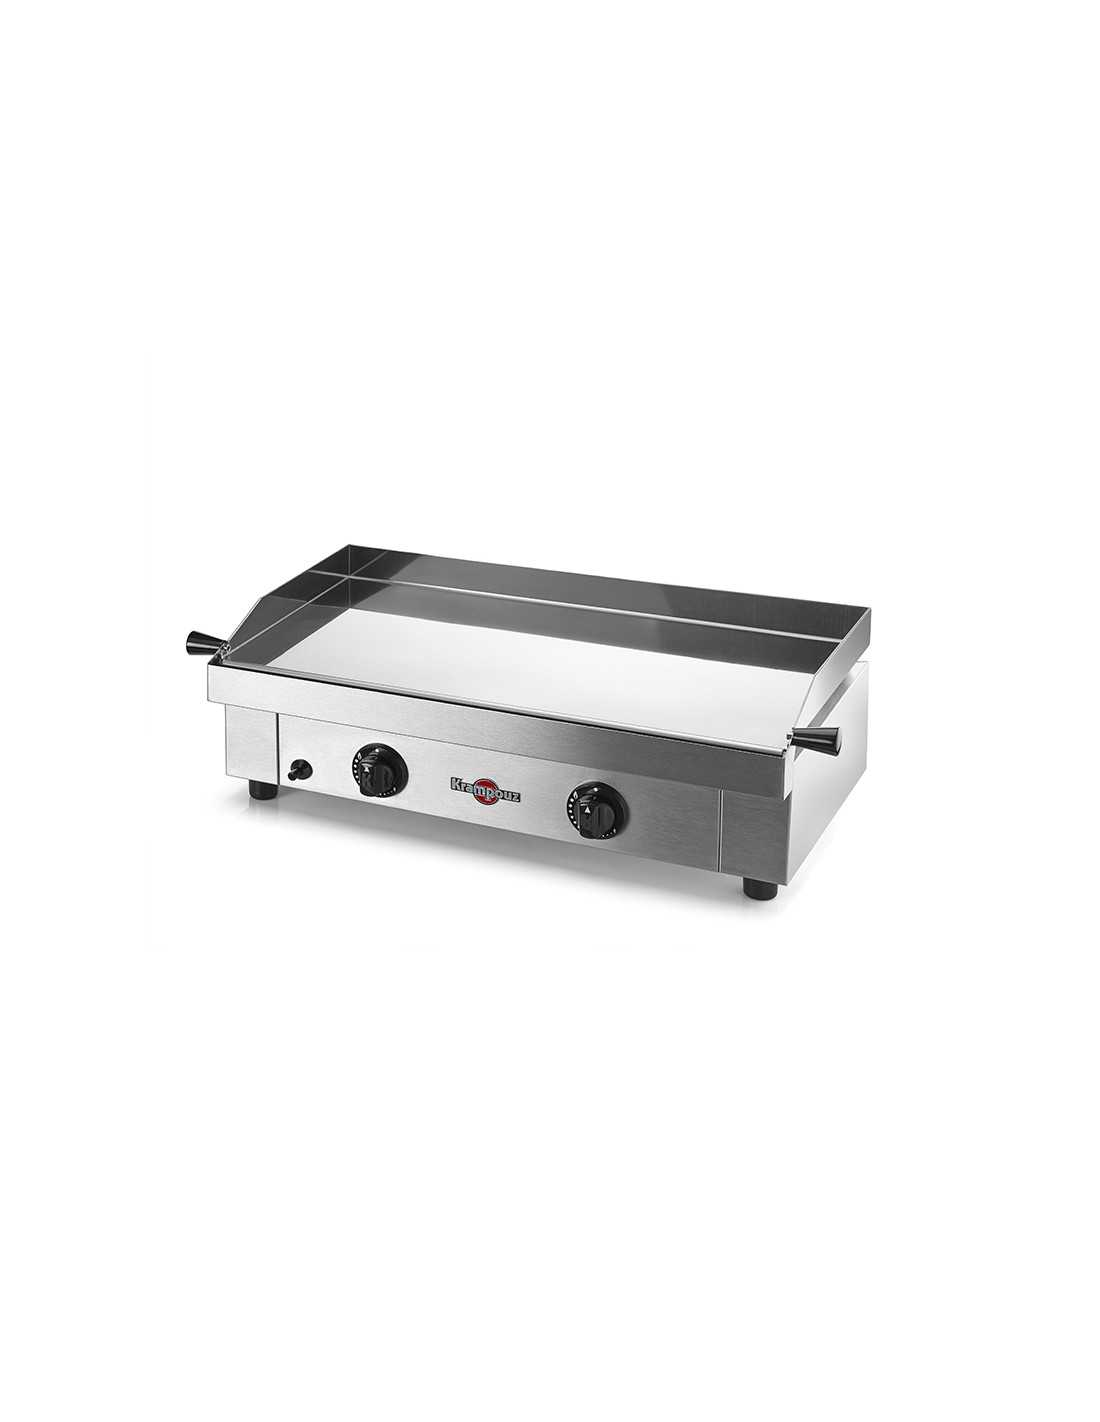 Barbecue Gaz Sans Plancha plancha gaz inox - saveur - 64x34